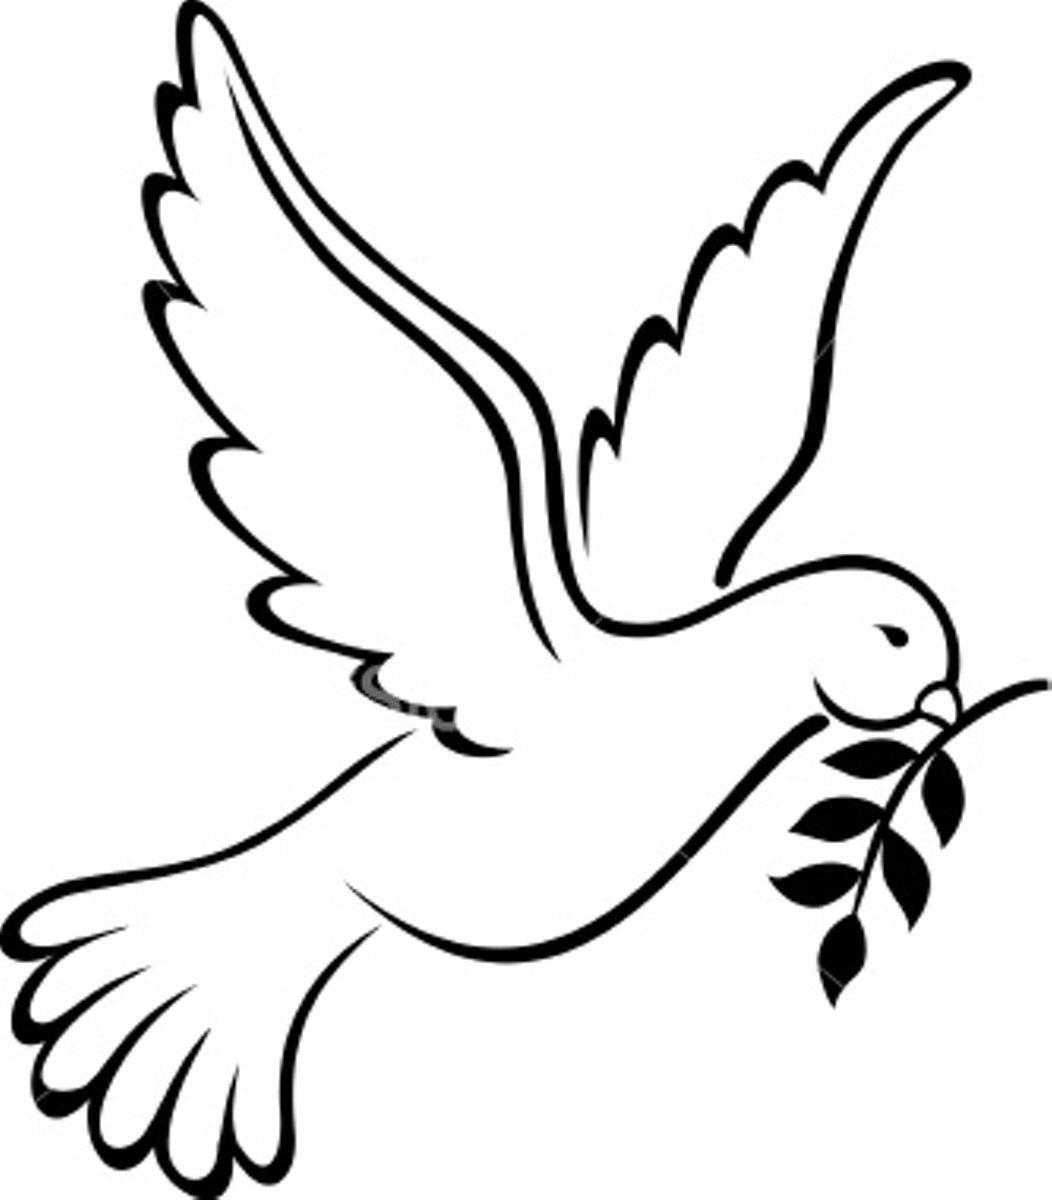 Clipart dove peace 2 » Clipart Portal.